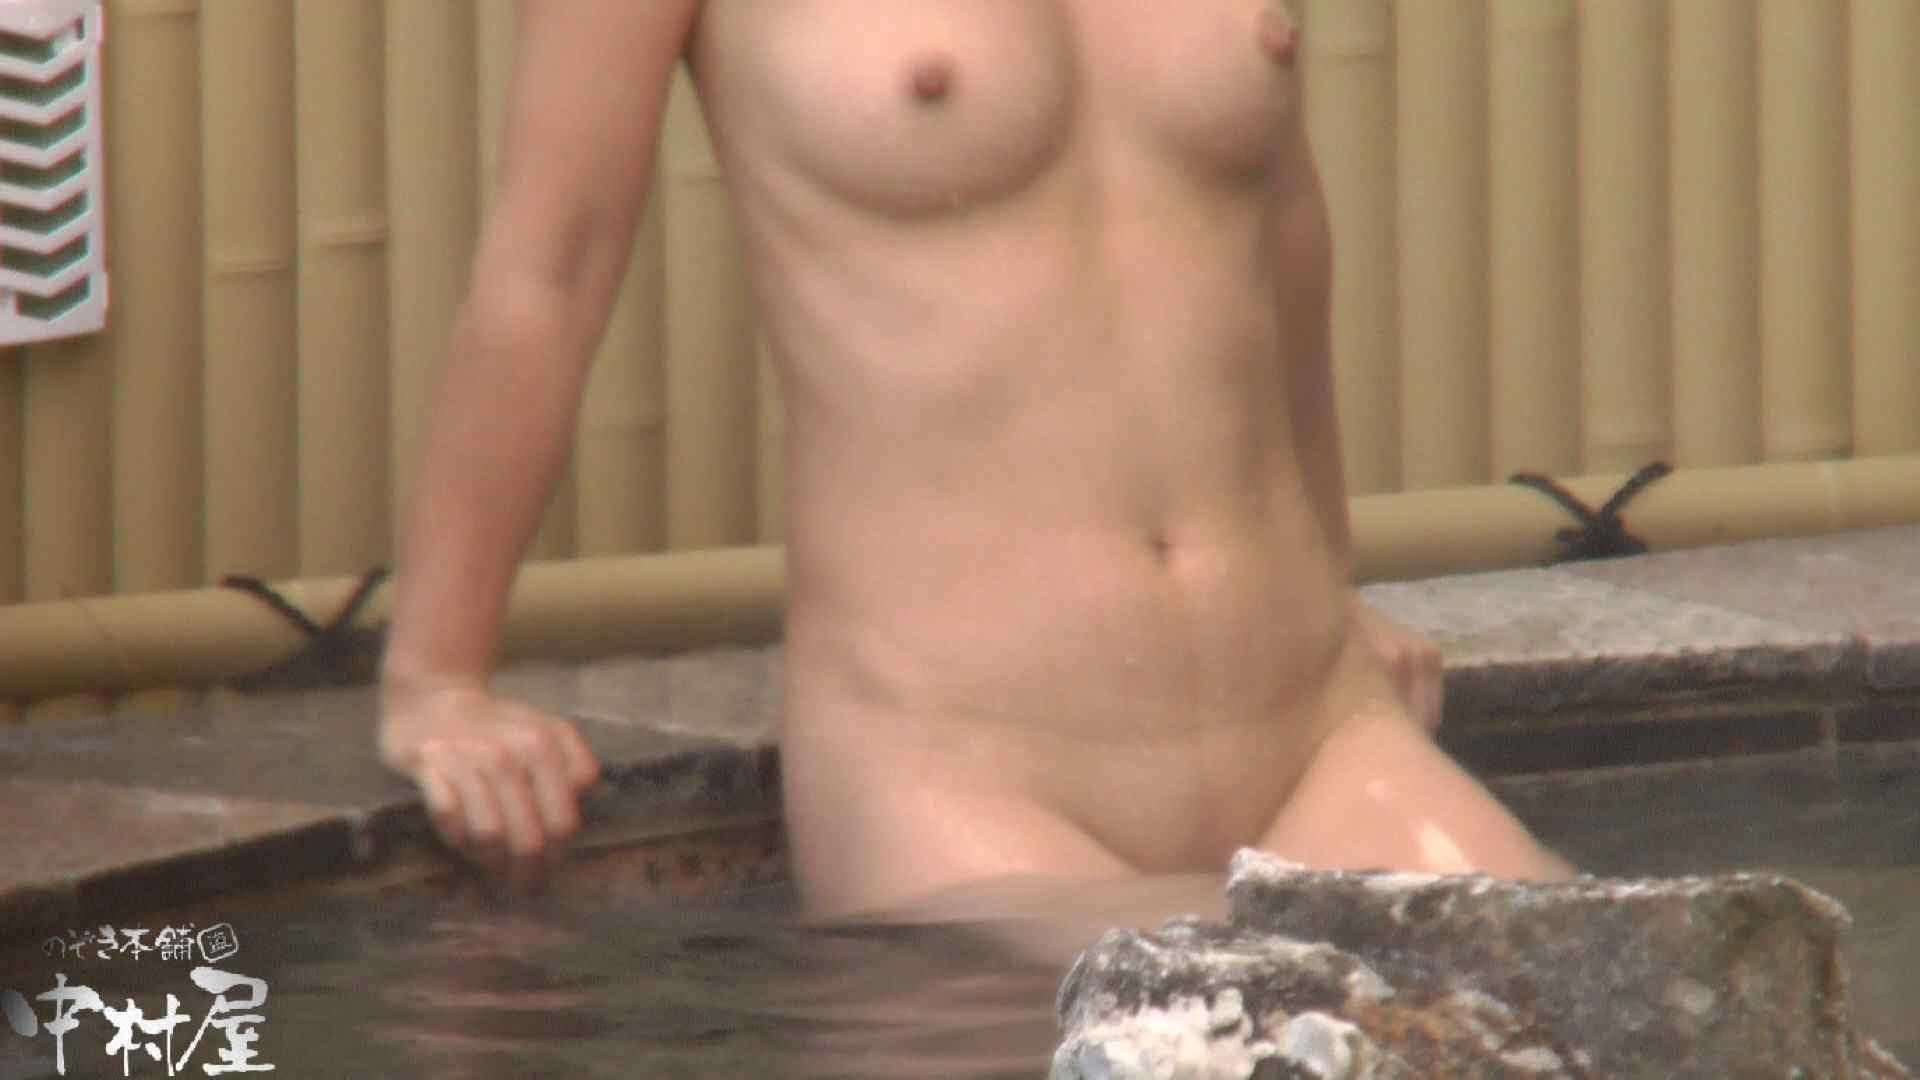 Aquaな露天風呂Vol.915 OLすけべ画像 オマンコ動画キャプチャ 99連発 17